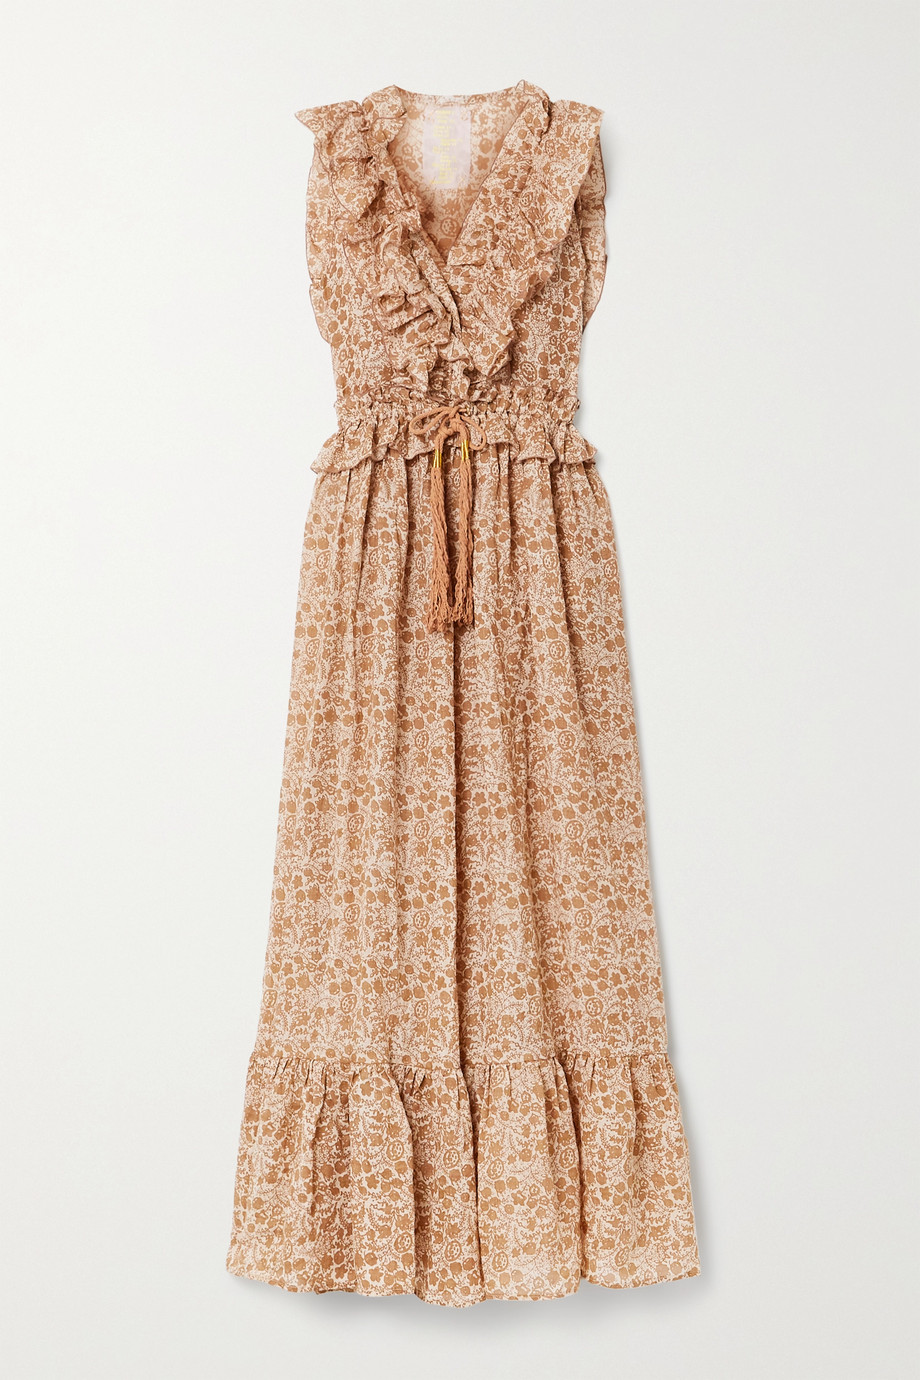 Yvonne S Marie Antoinette ruffled floral-print linen maxi dress